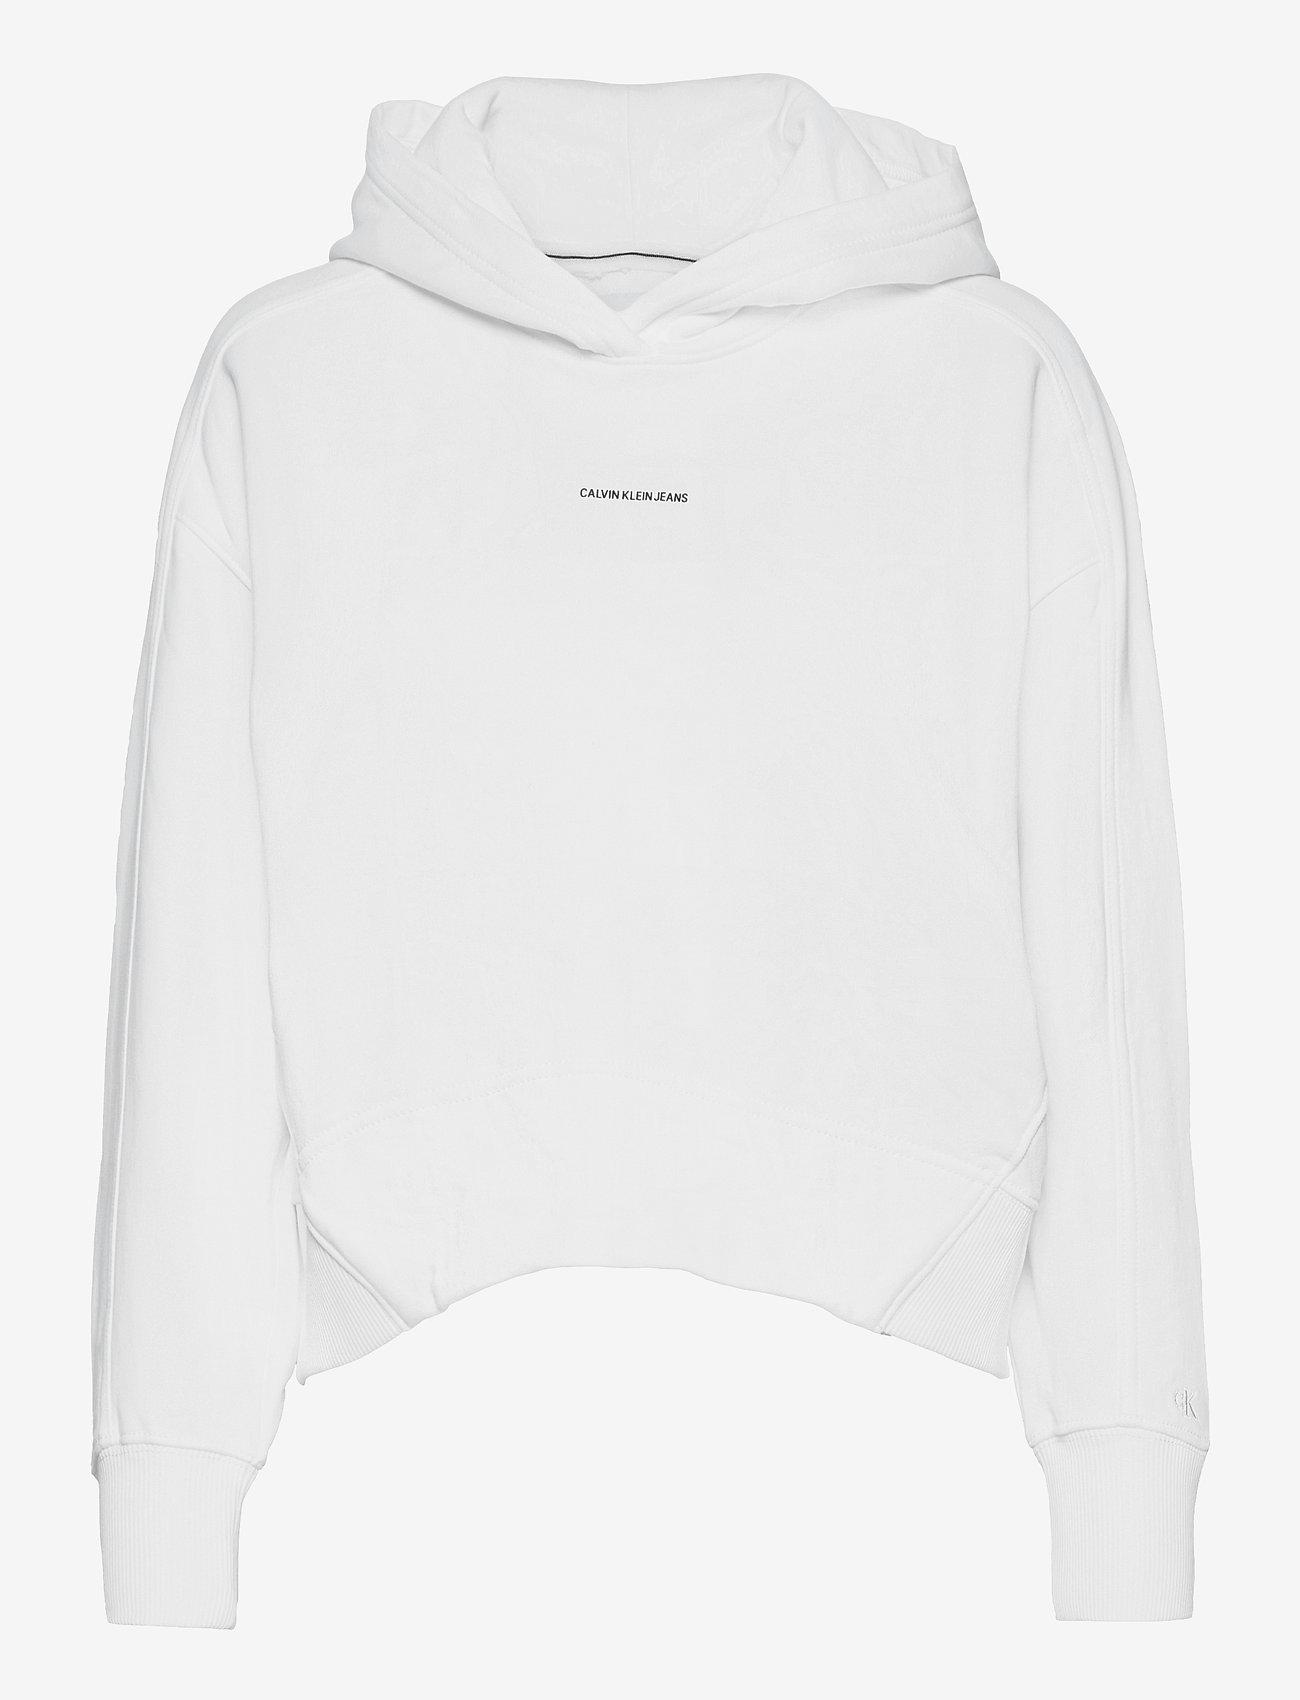 Calvin Klein Jeans - MICRO BRANDING HOODIE - hettegensere - bright white - 0